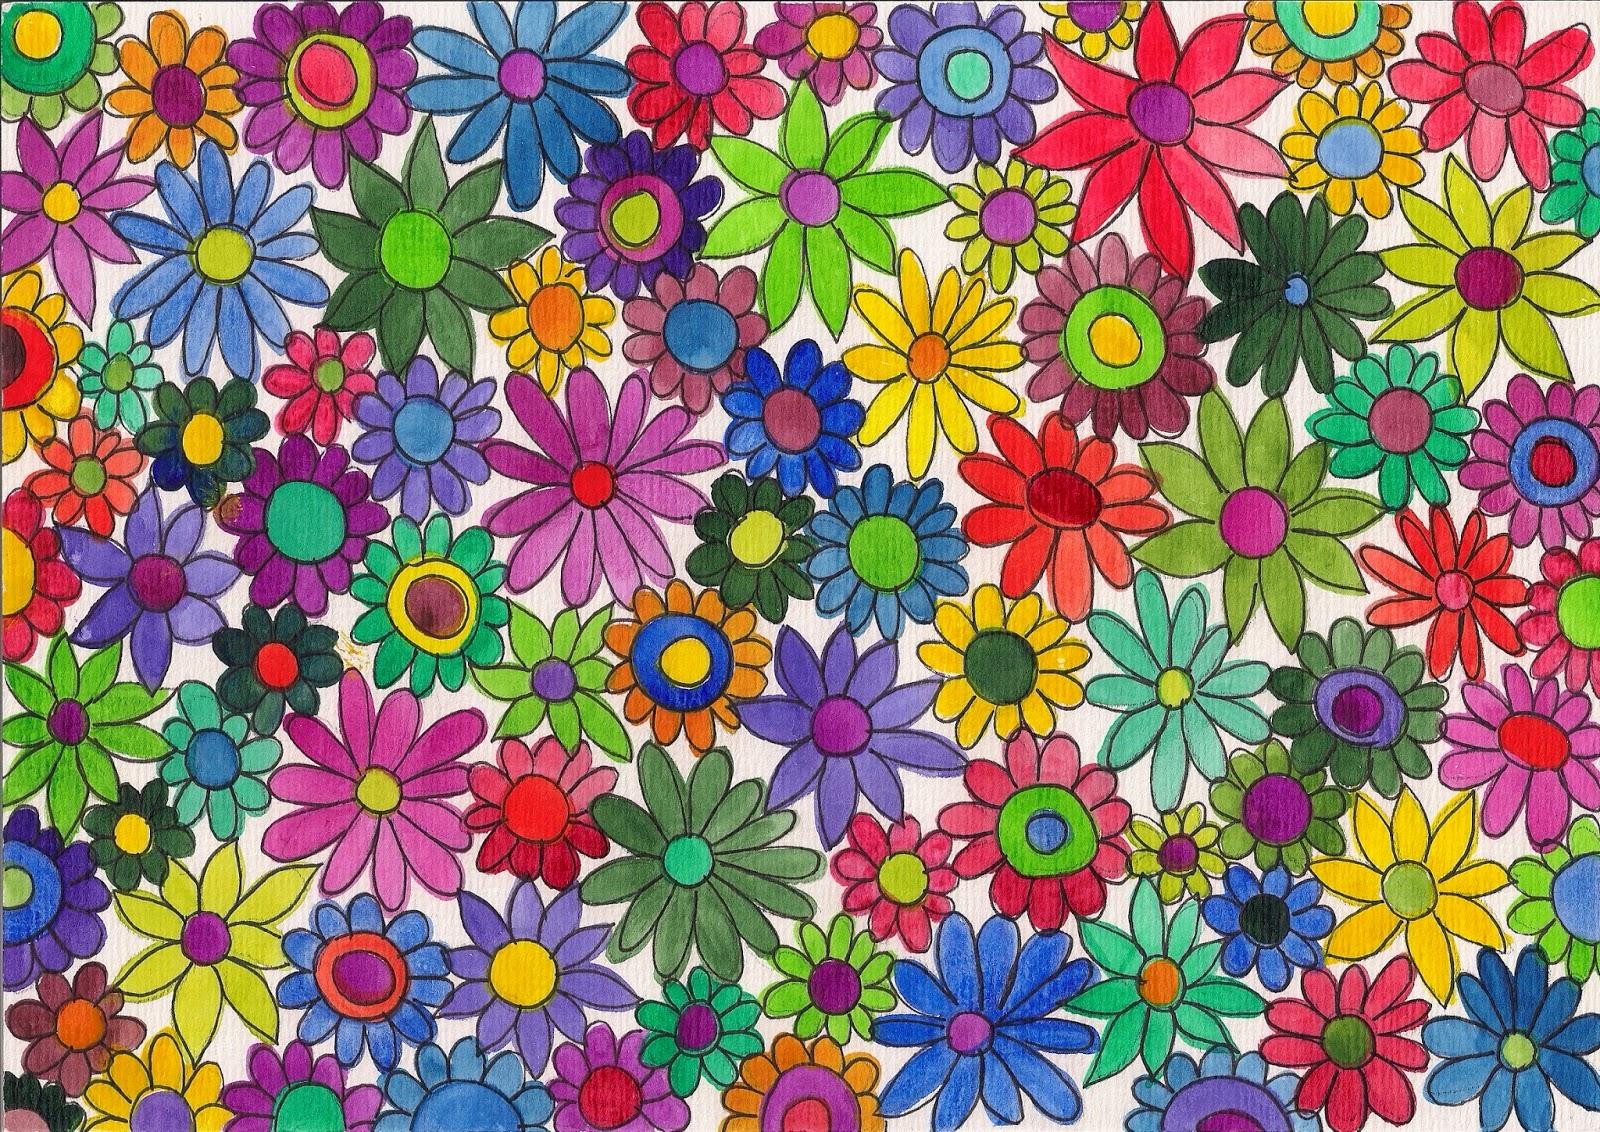 Blumenmuster Malen